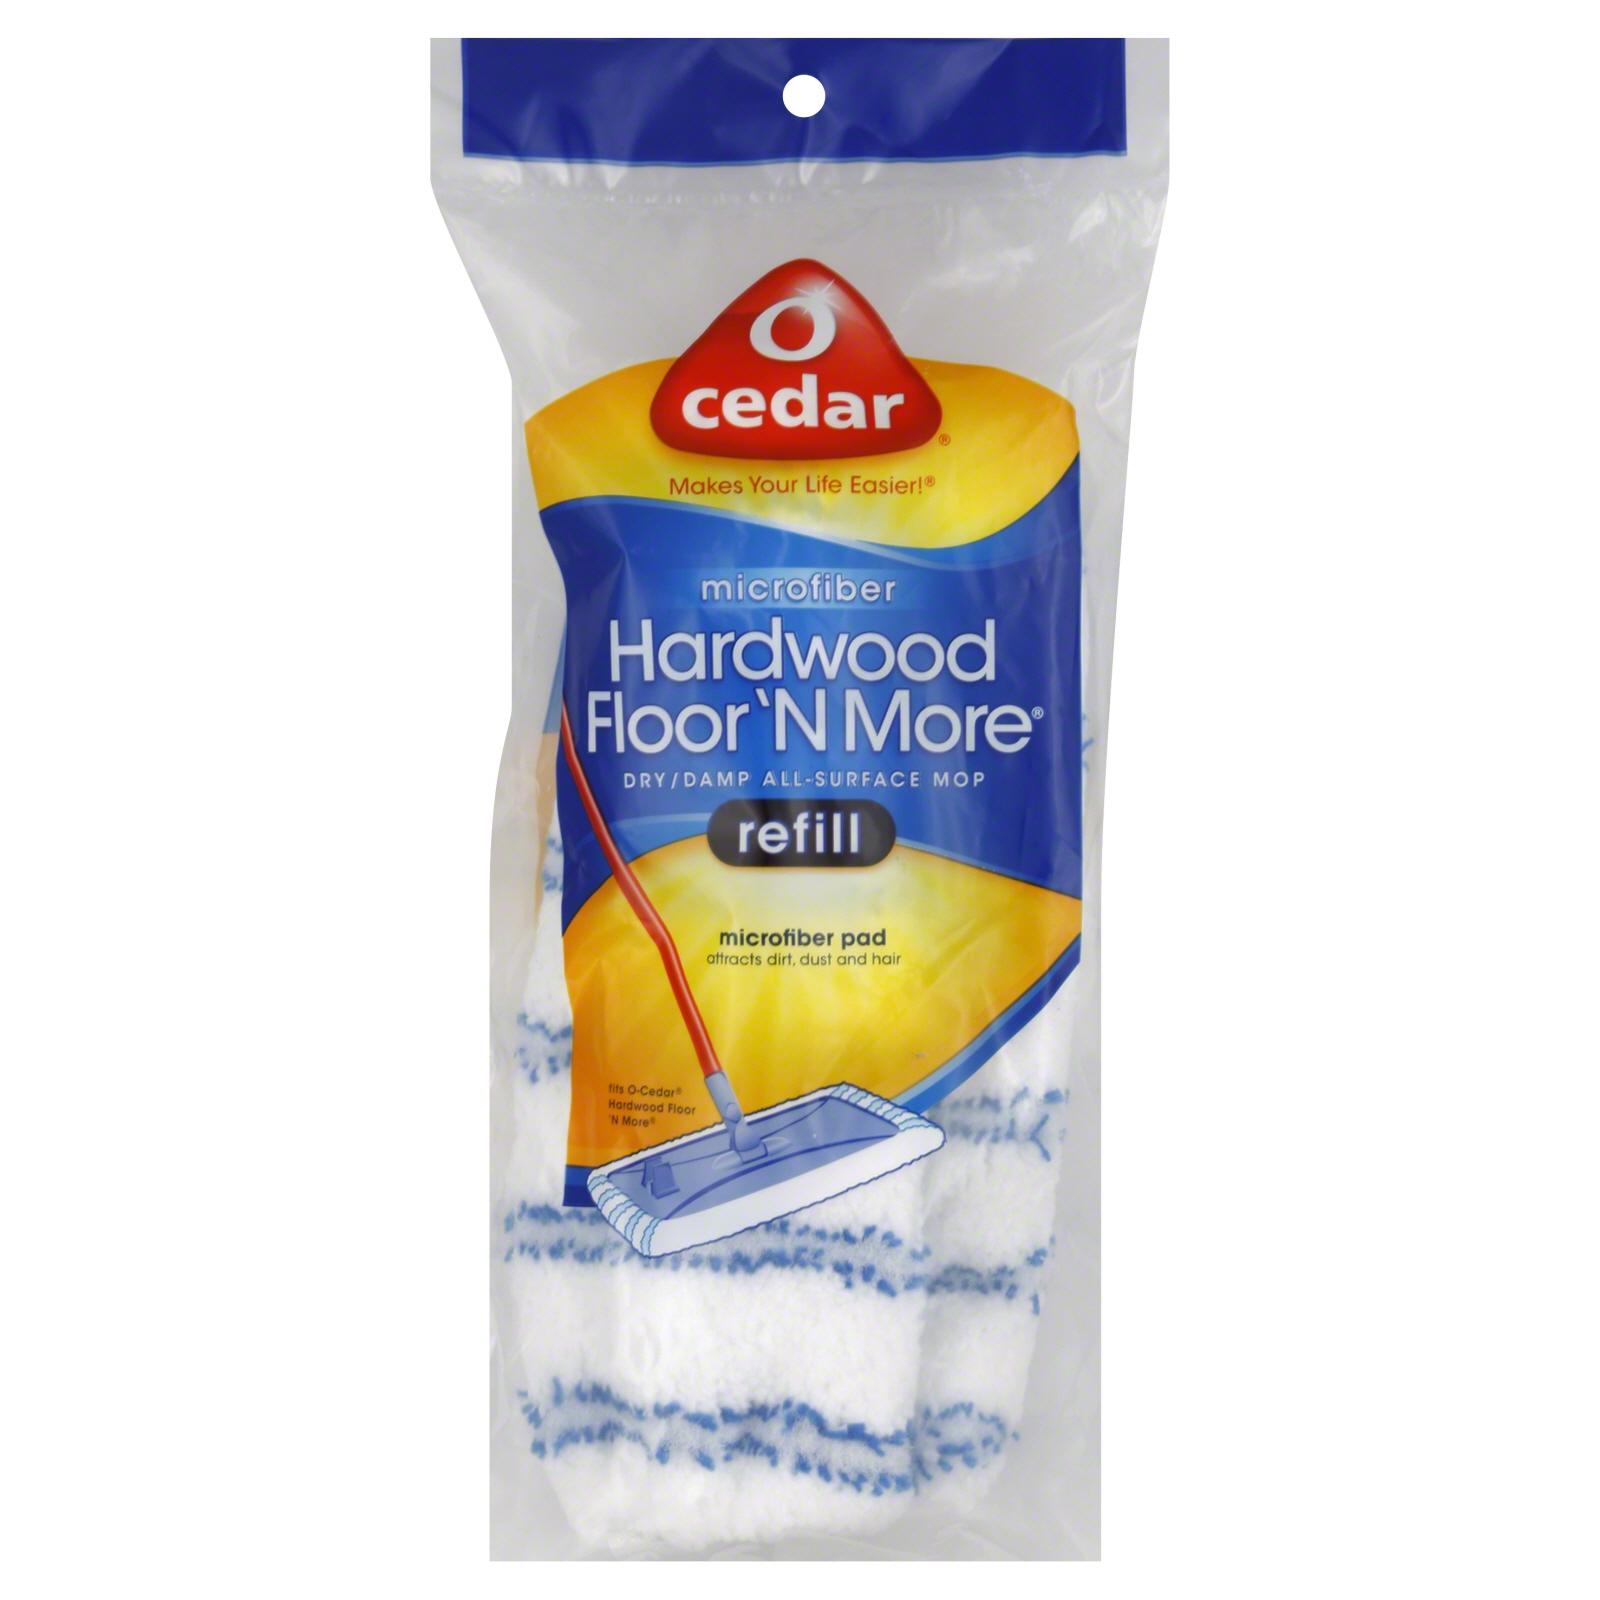 Cedar Hardwood Floor ' Mop Refill